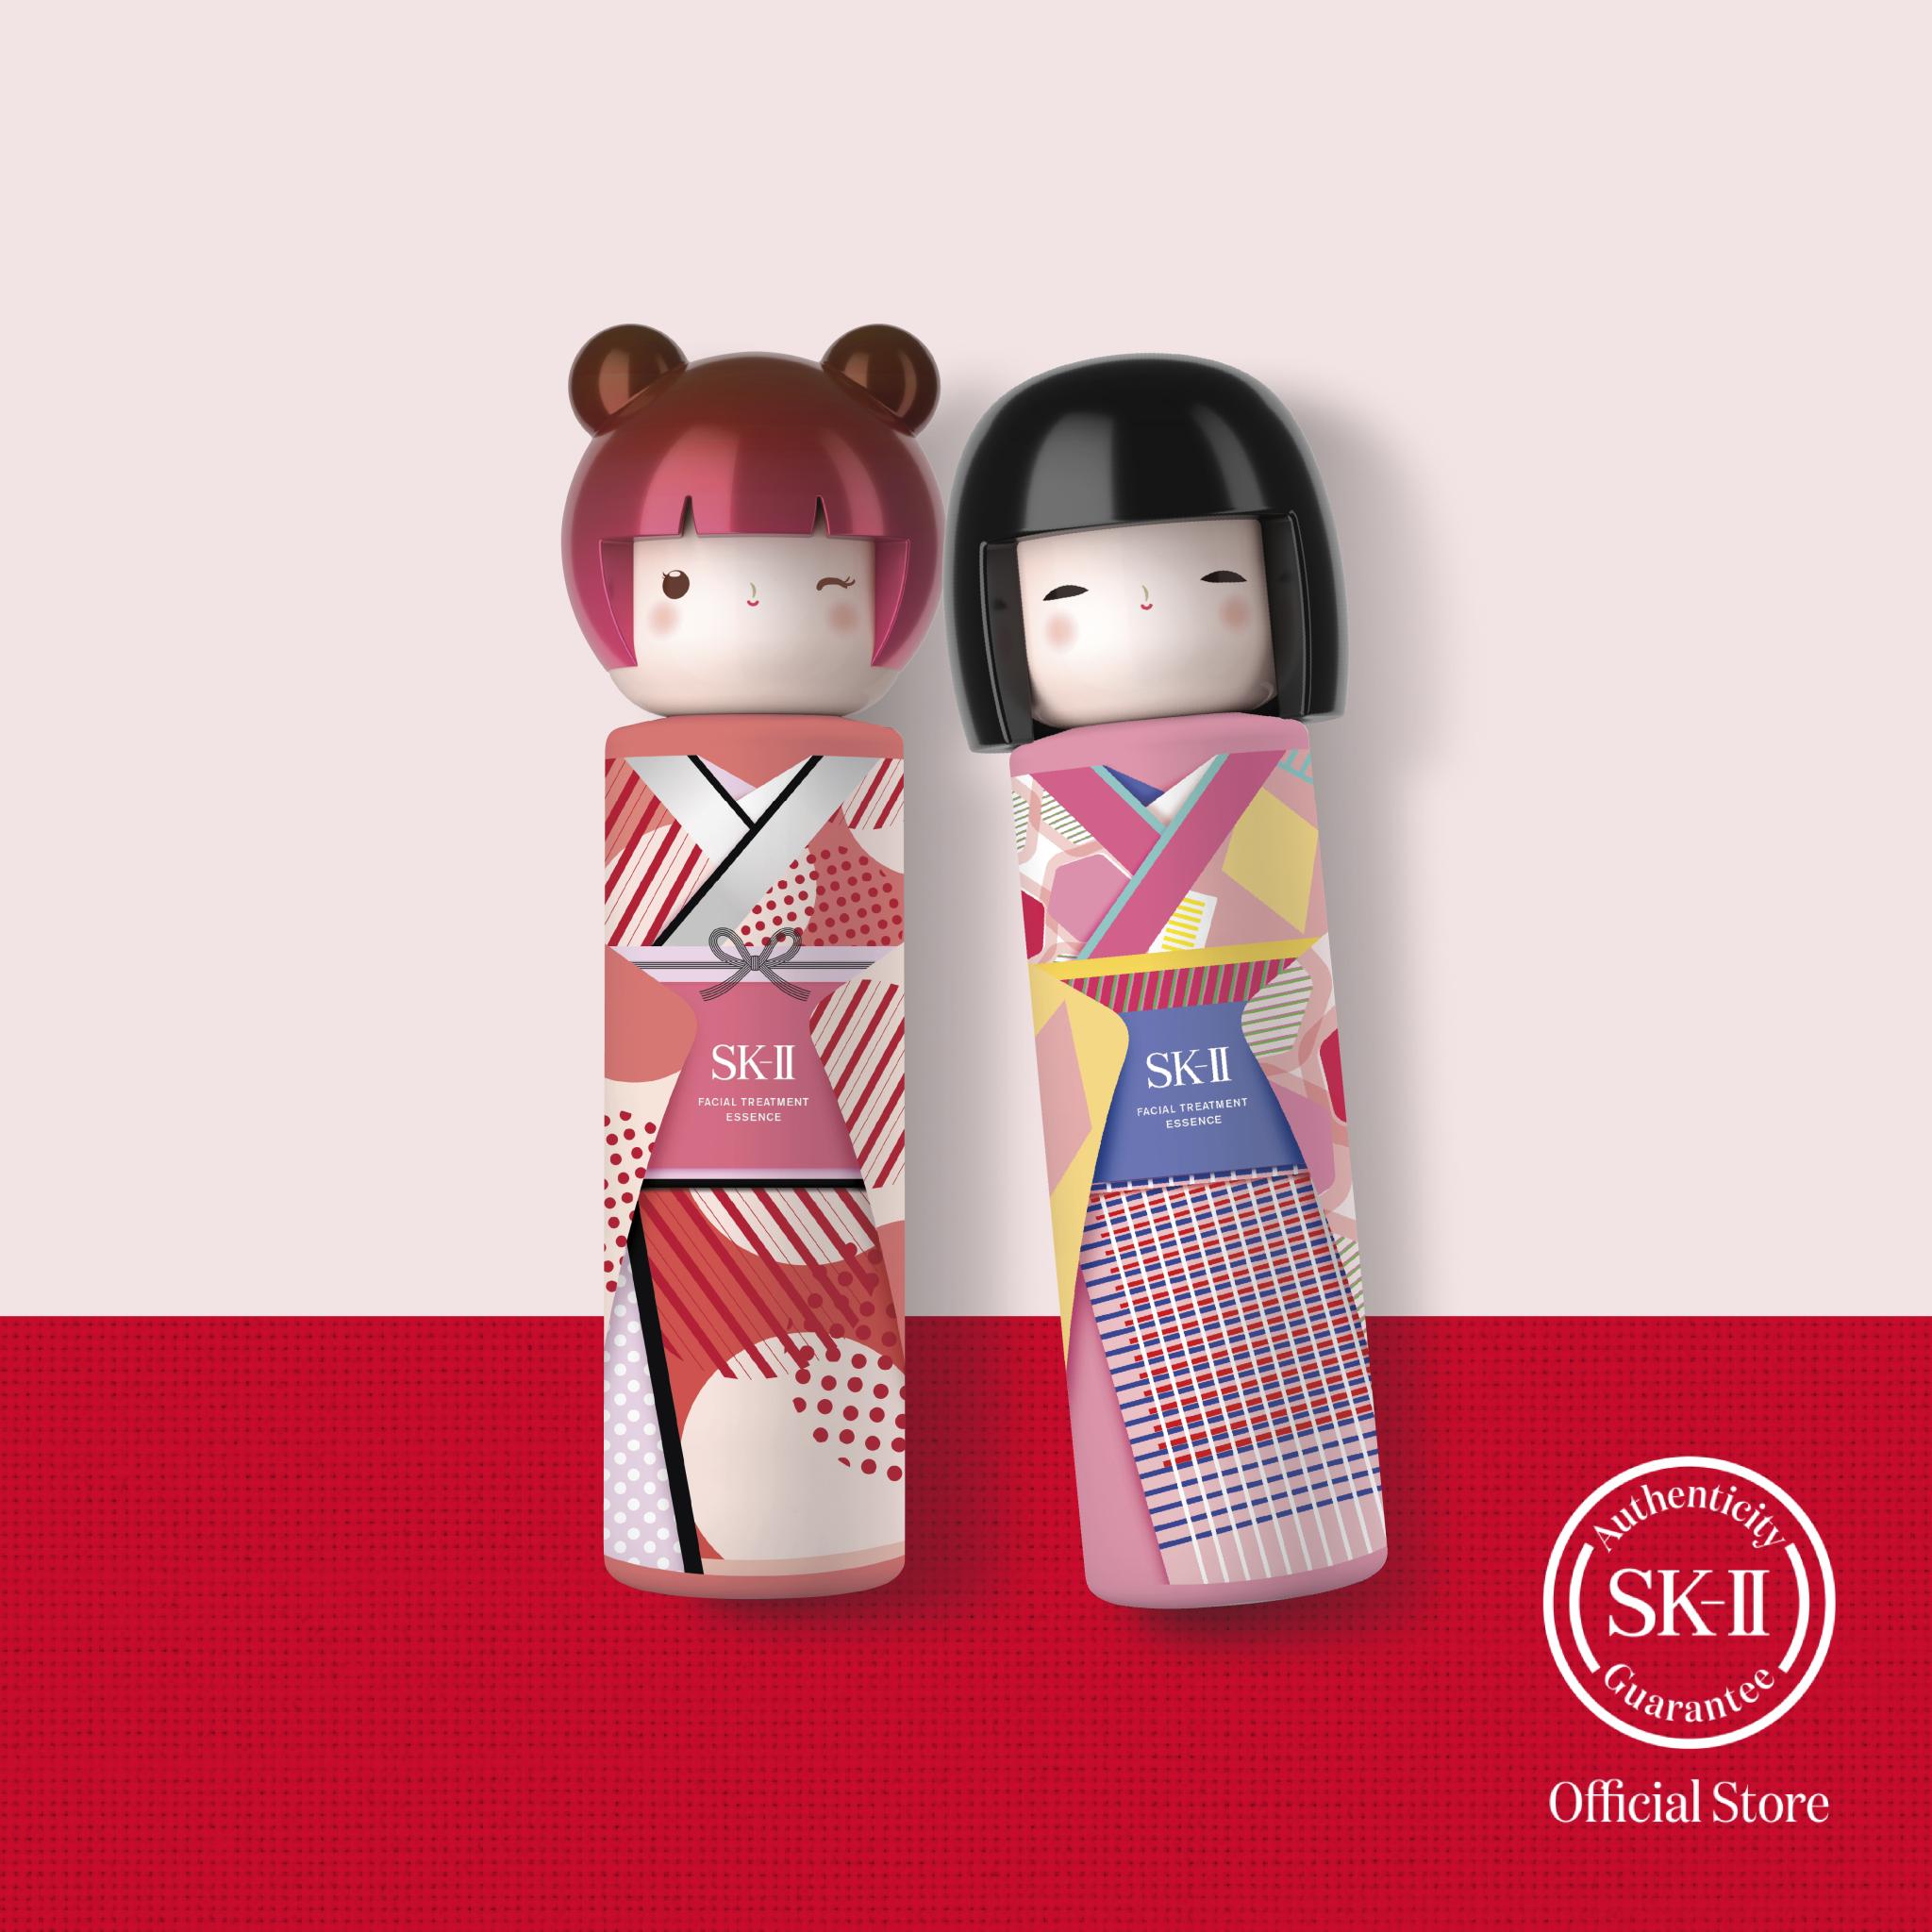 Menggemaskan, Skincare Ini Hadir Dalam Balutan Kimono